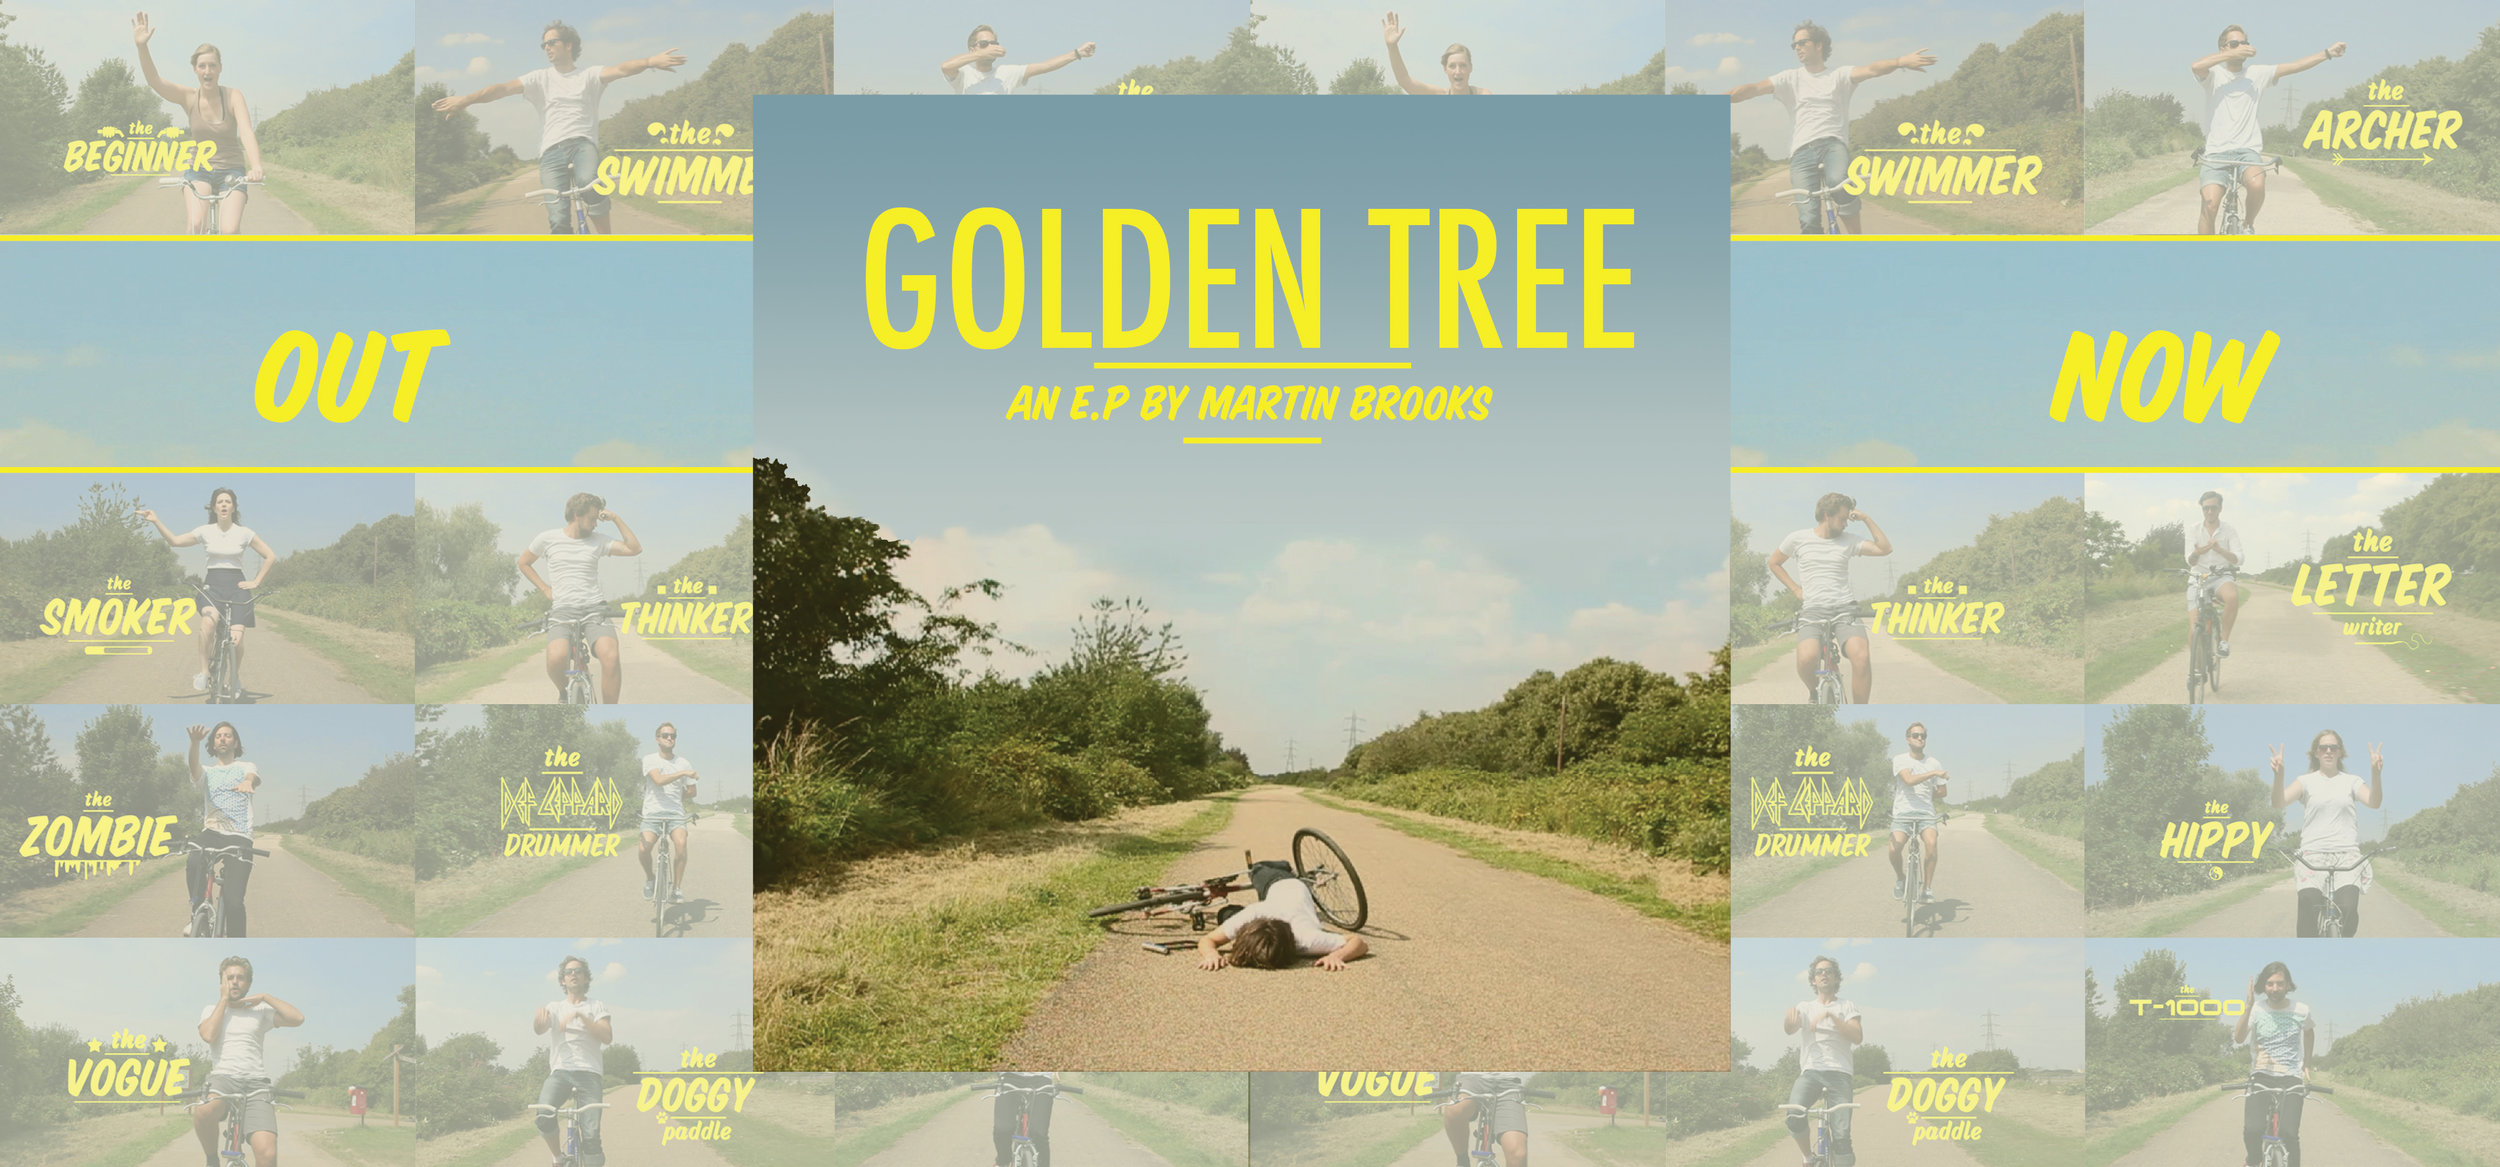 Golden Tree Bannar.jpg